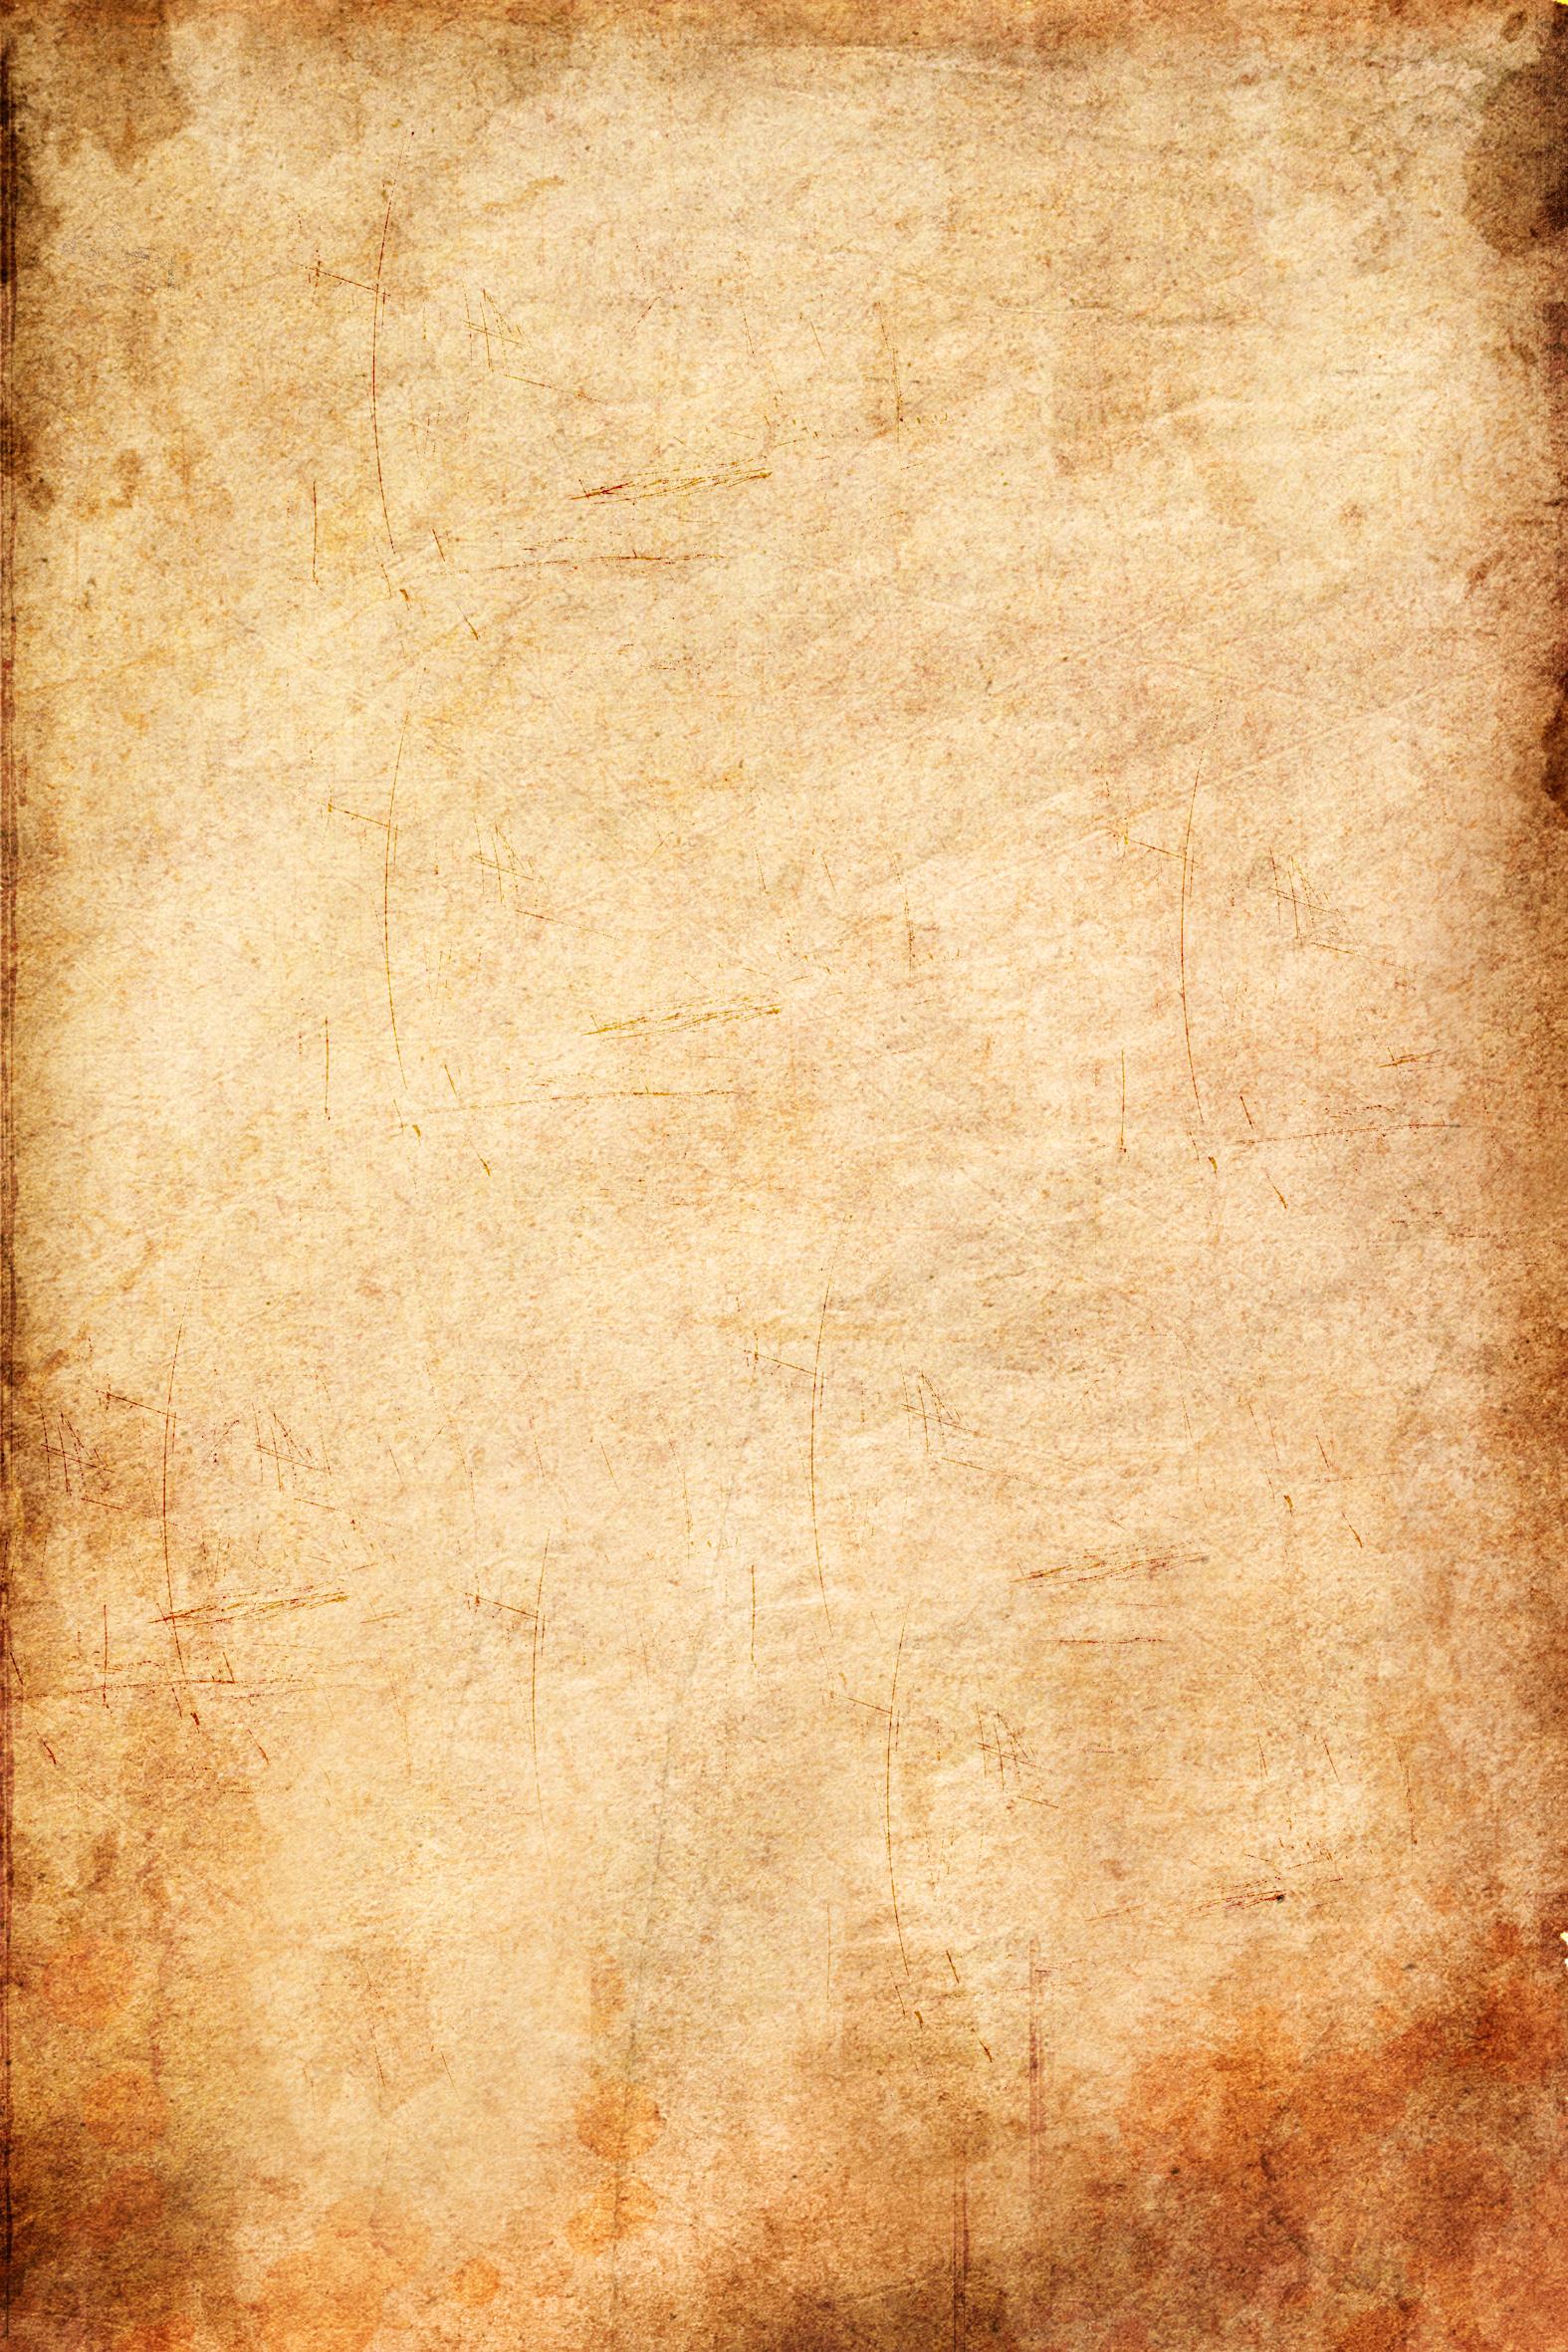 Бумага для фона портрета